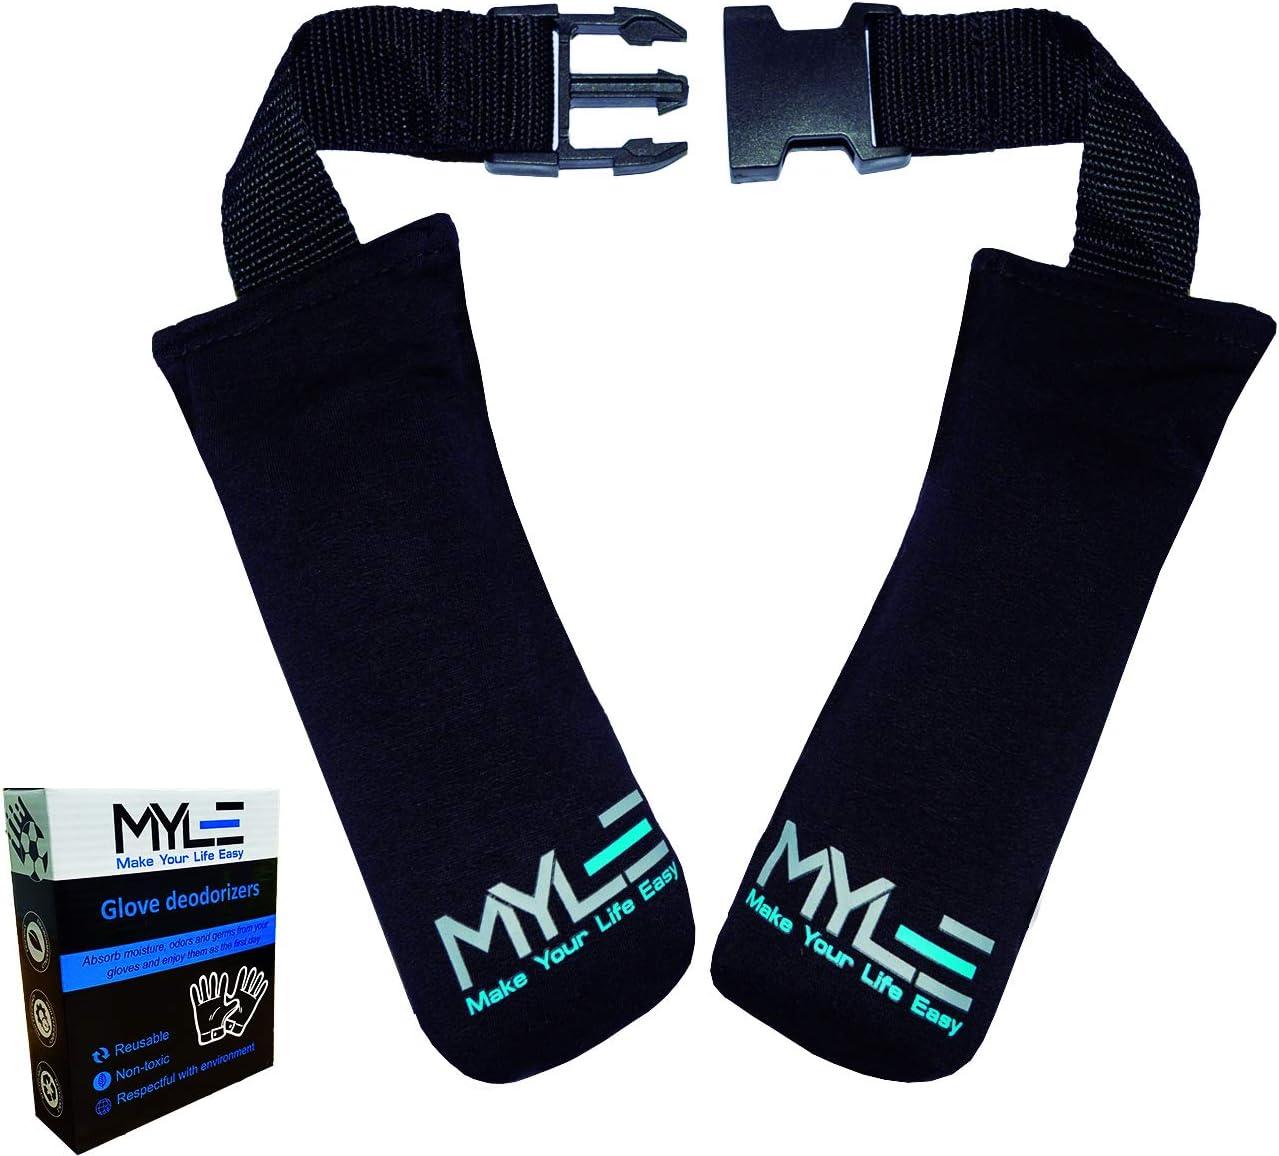 MYLE MAKE YOUR LIFE EASY Desodorante Guantes de Boxeo, Guantes de Portero, Botas Boxeo, Botas de Montaña, Botas Snowboard, Zapatillas de Running.